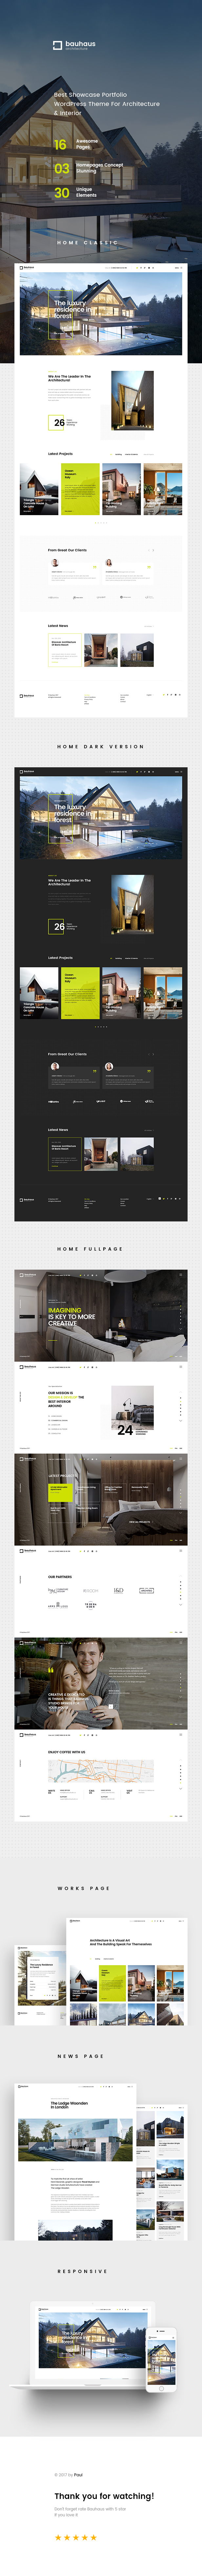 Bauhaus - Architecture & Interior WordPress Theme - 5